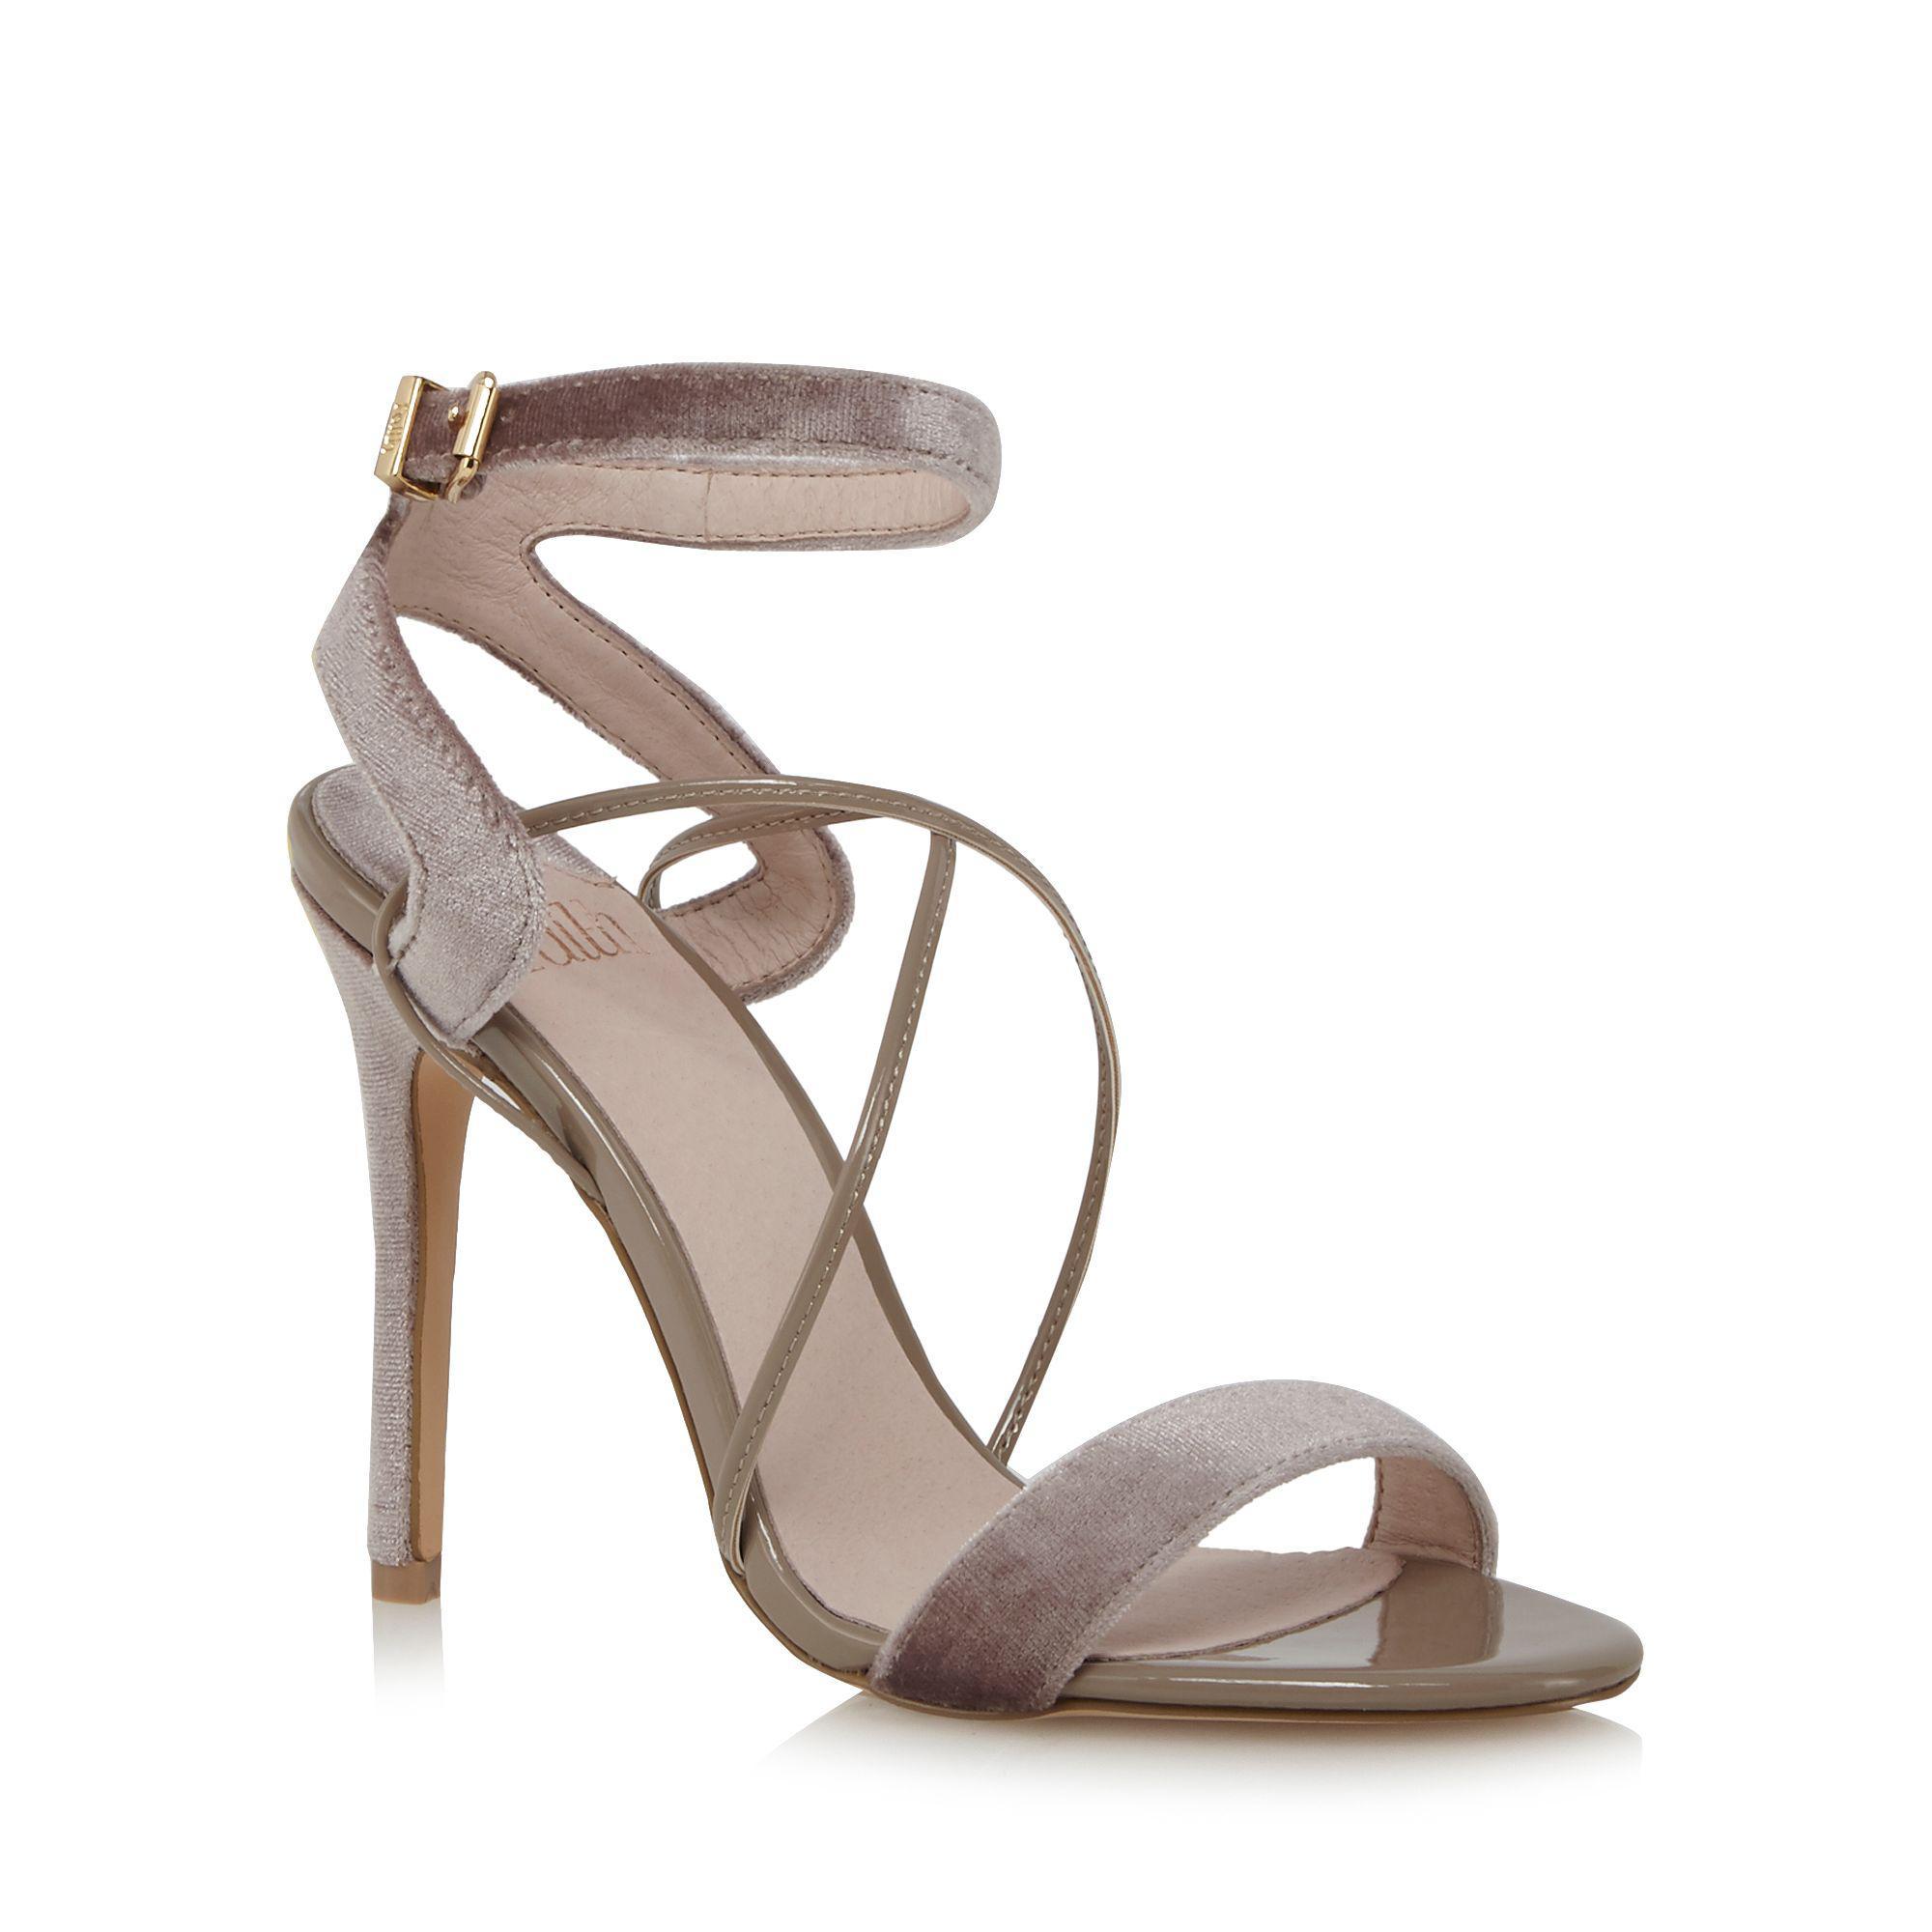 8c6a31bf35b0 Faith Purple  dana  High Stiletto Heel Ankle Strap Sandals in Purple ...